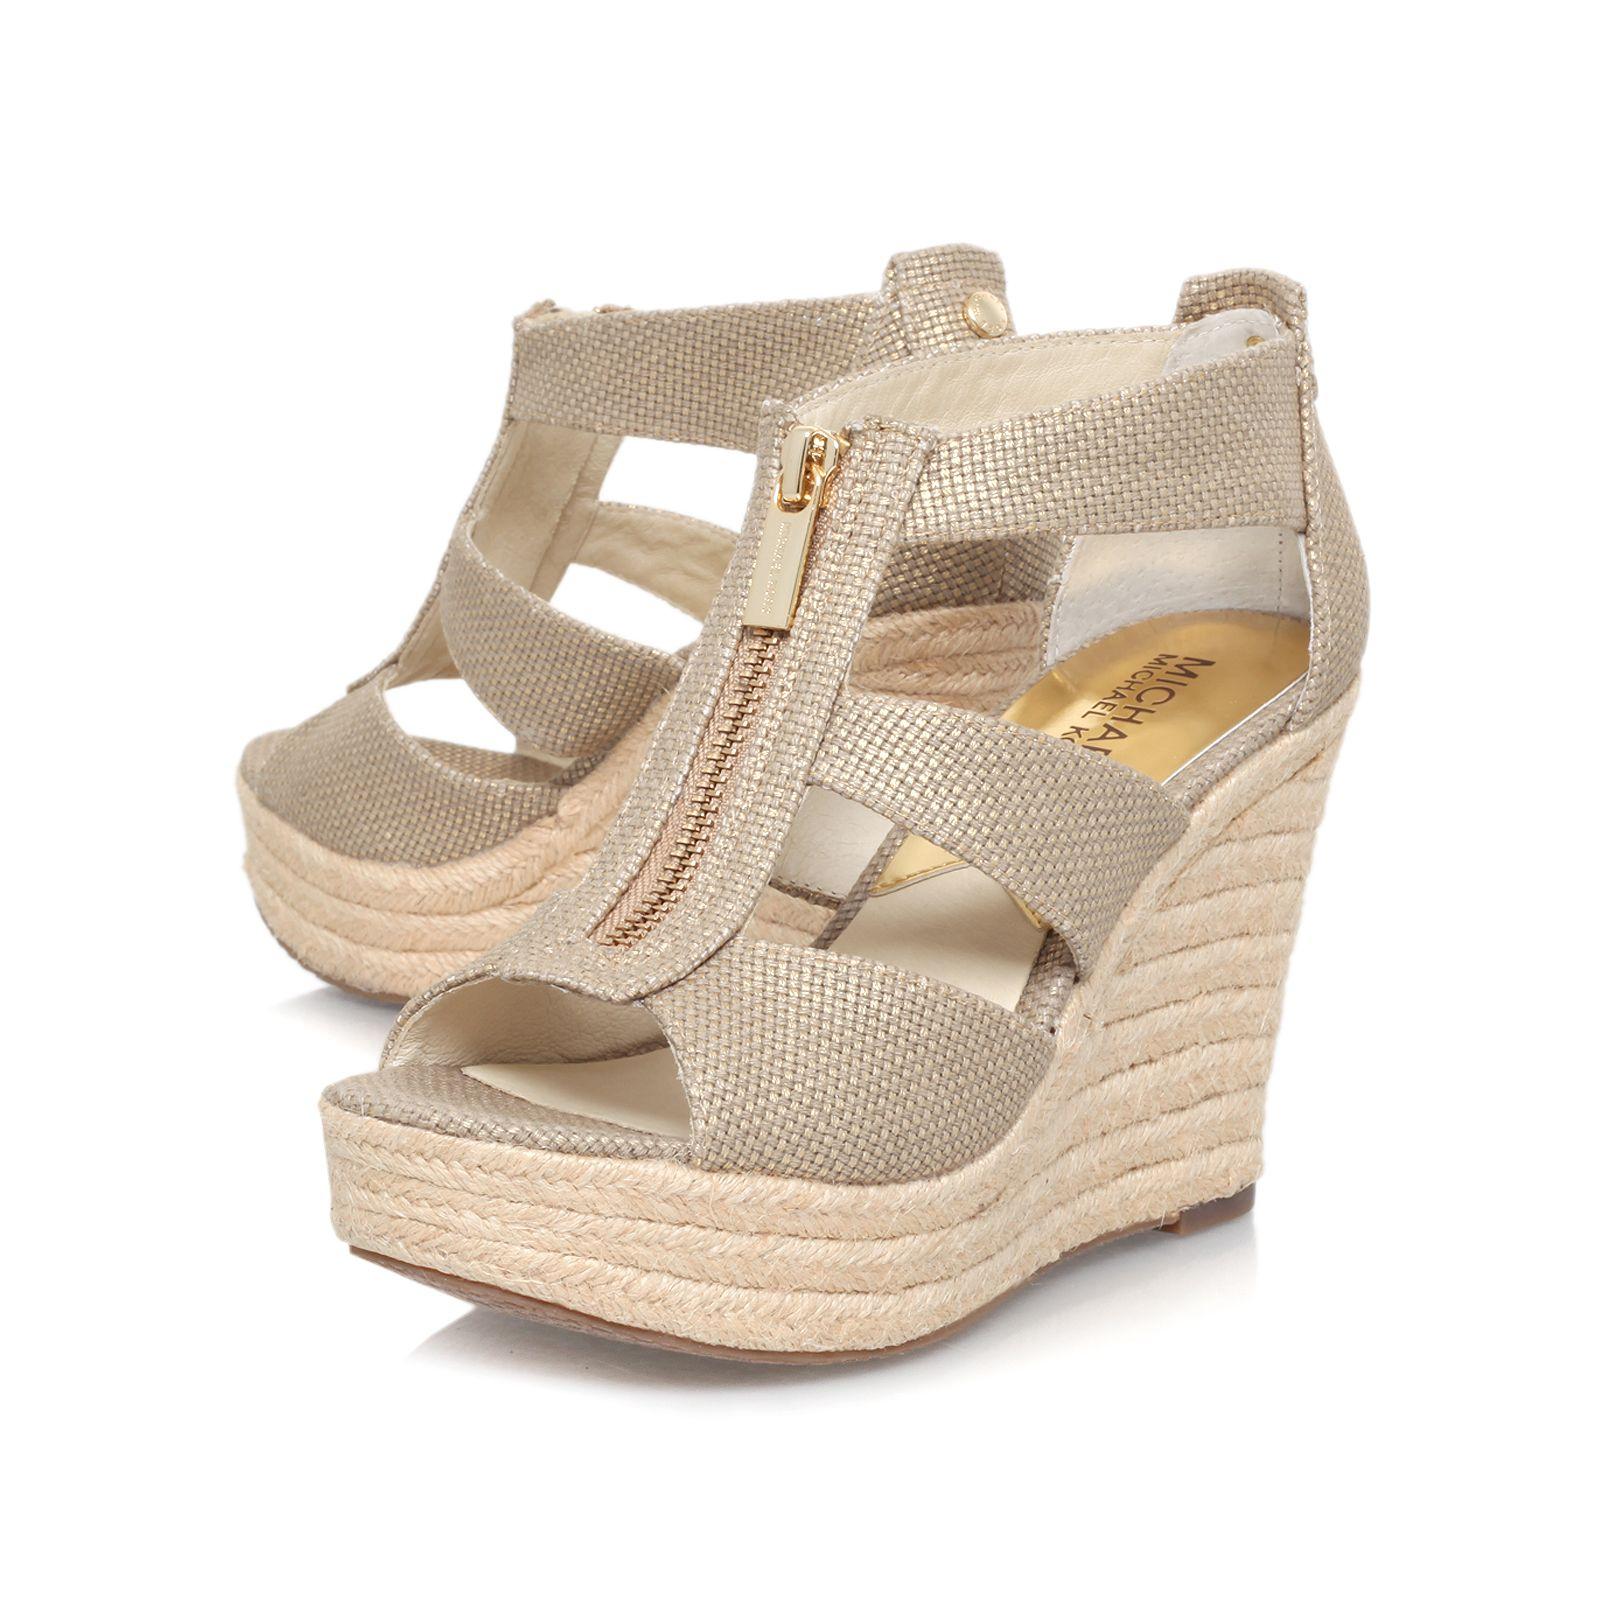 Cheap mother michael michael kors damita wedge sandals that look expensive